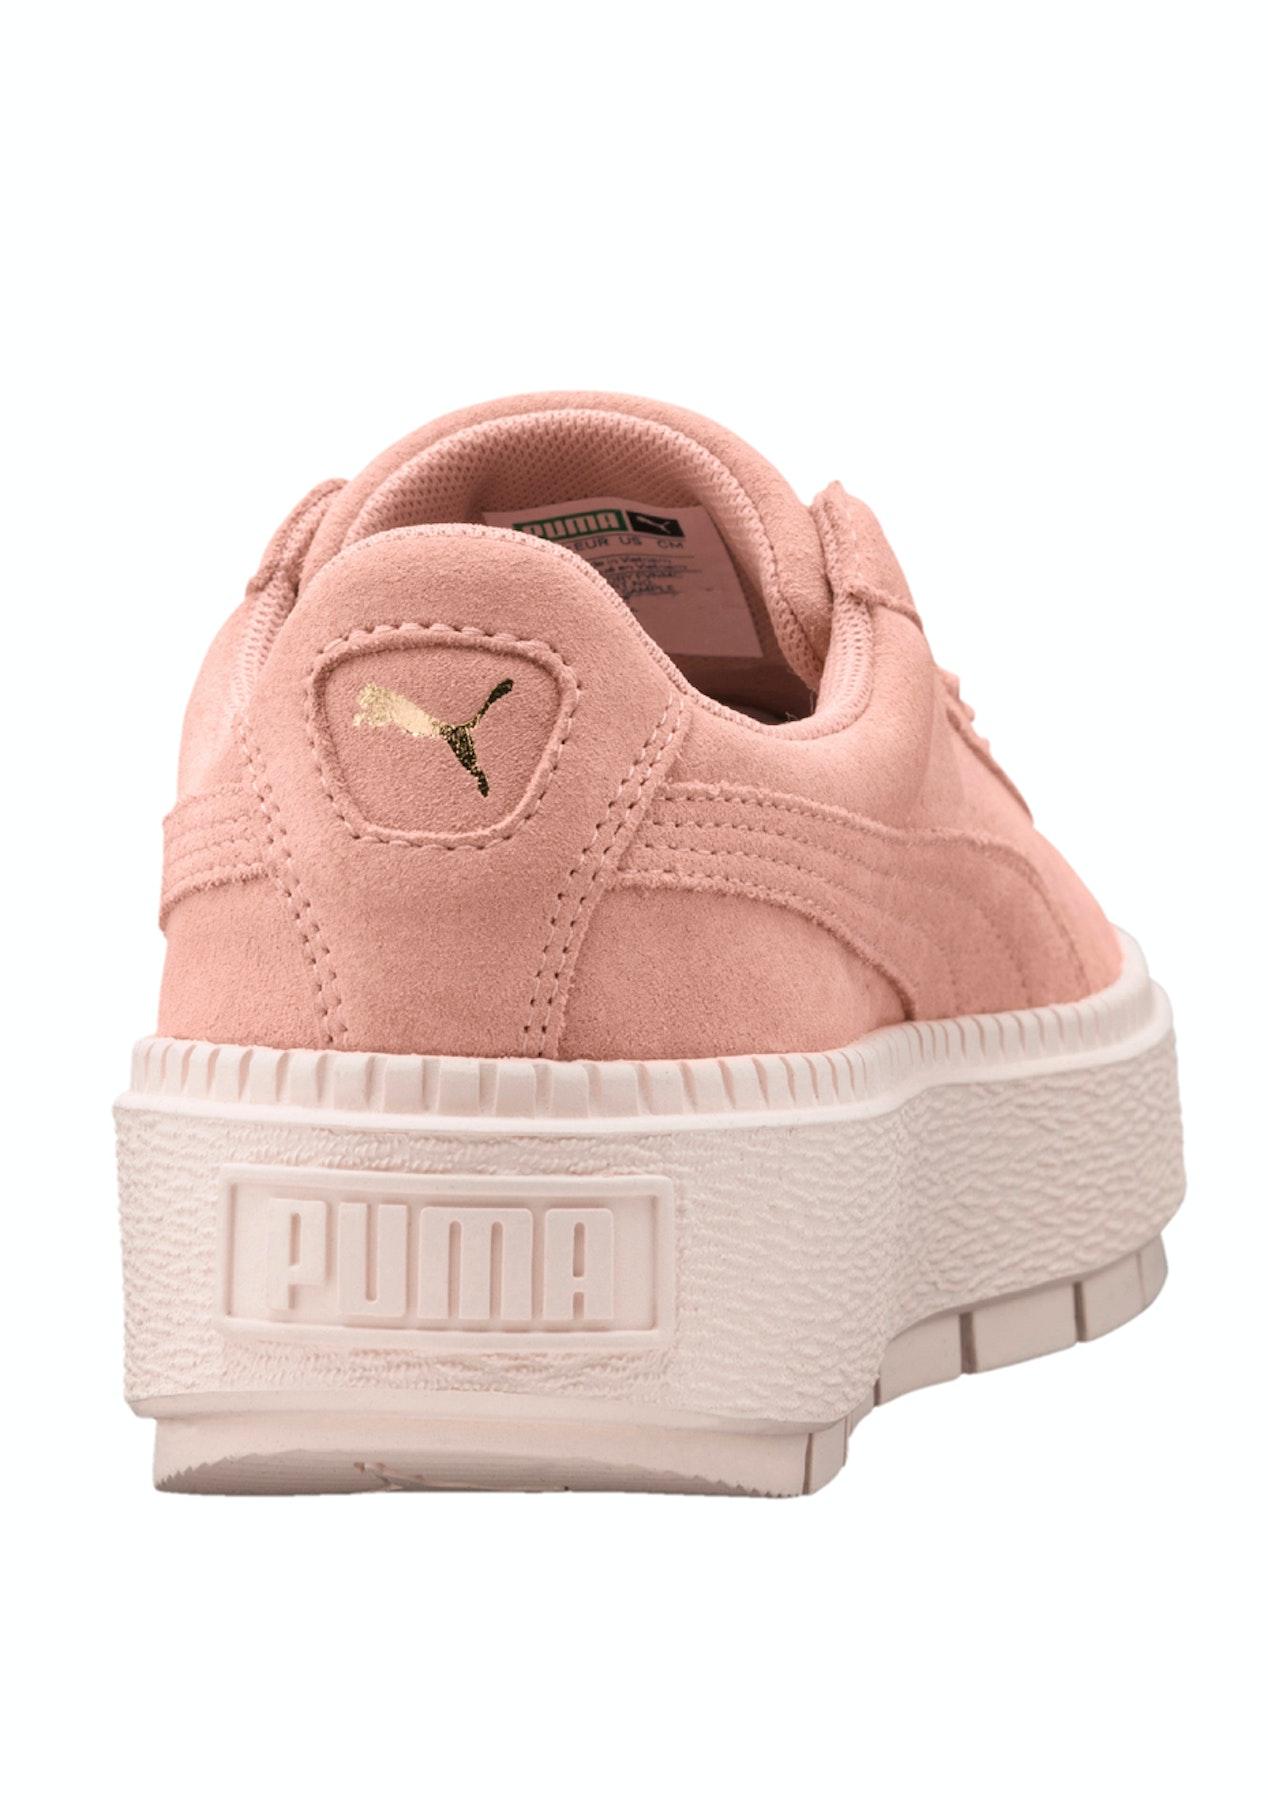 5e1f89a23ad42c Puma Womens - Suede Platform Trace - Peach - PUMA Under  100 Mega Sale -  Onceit